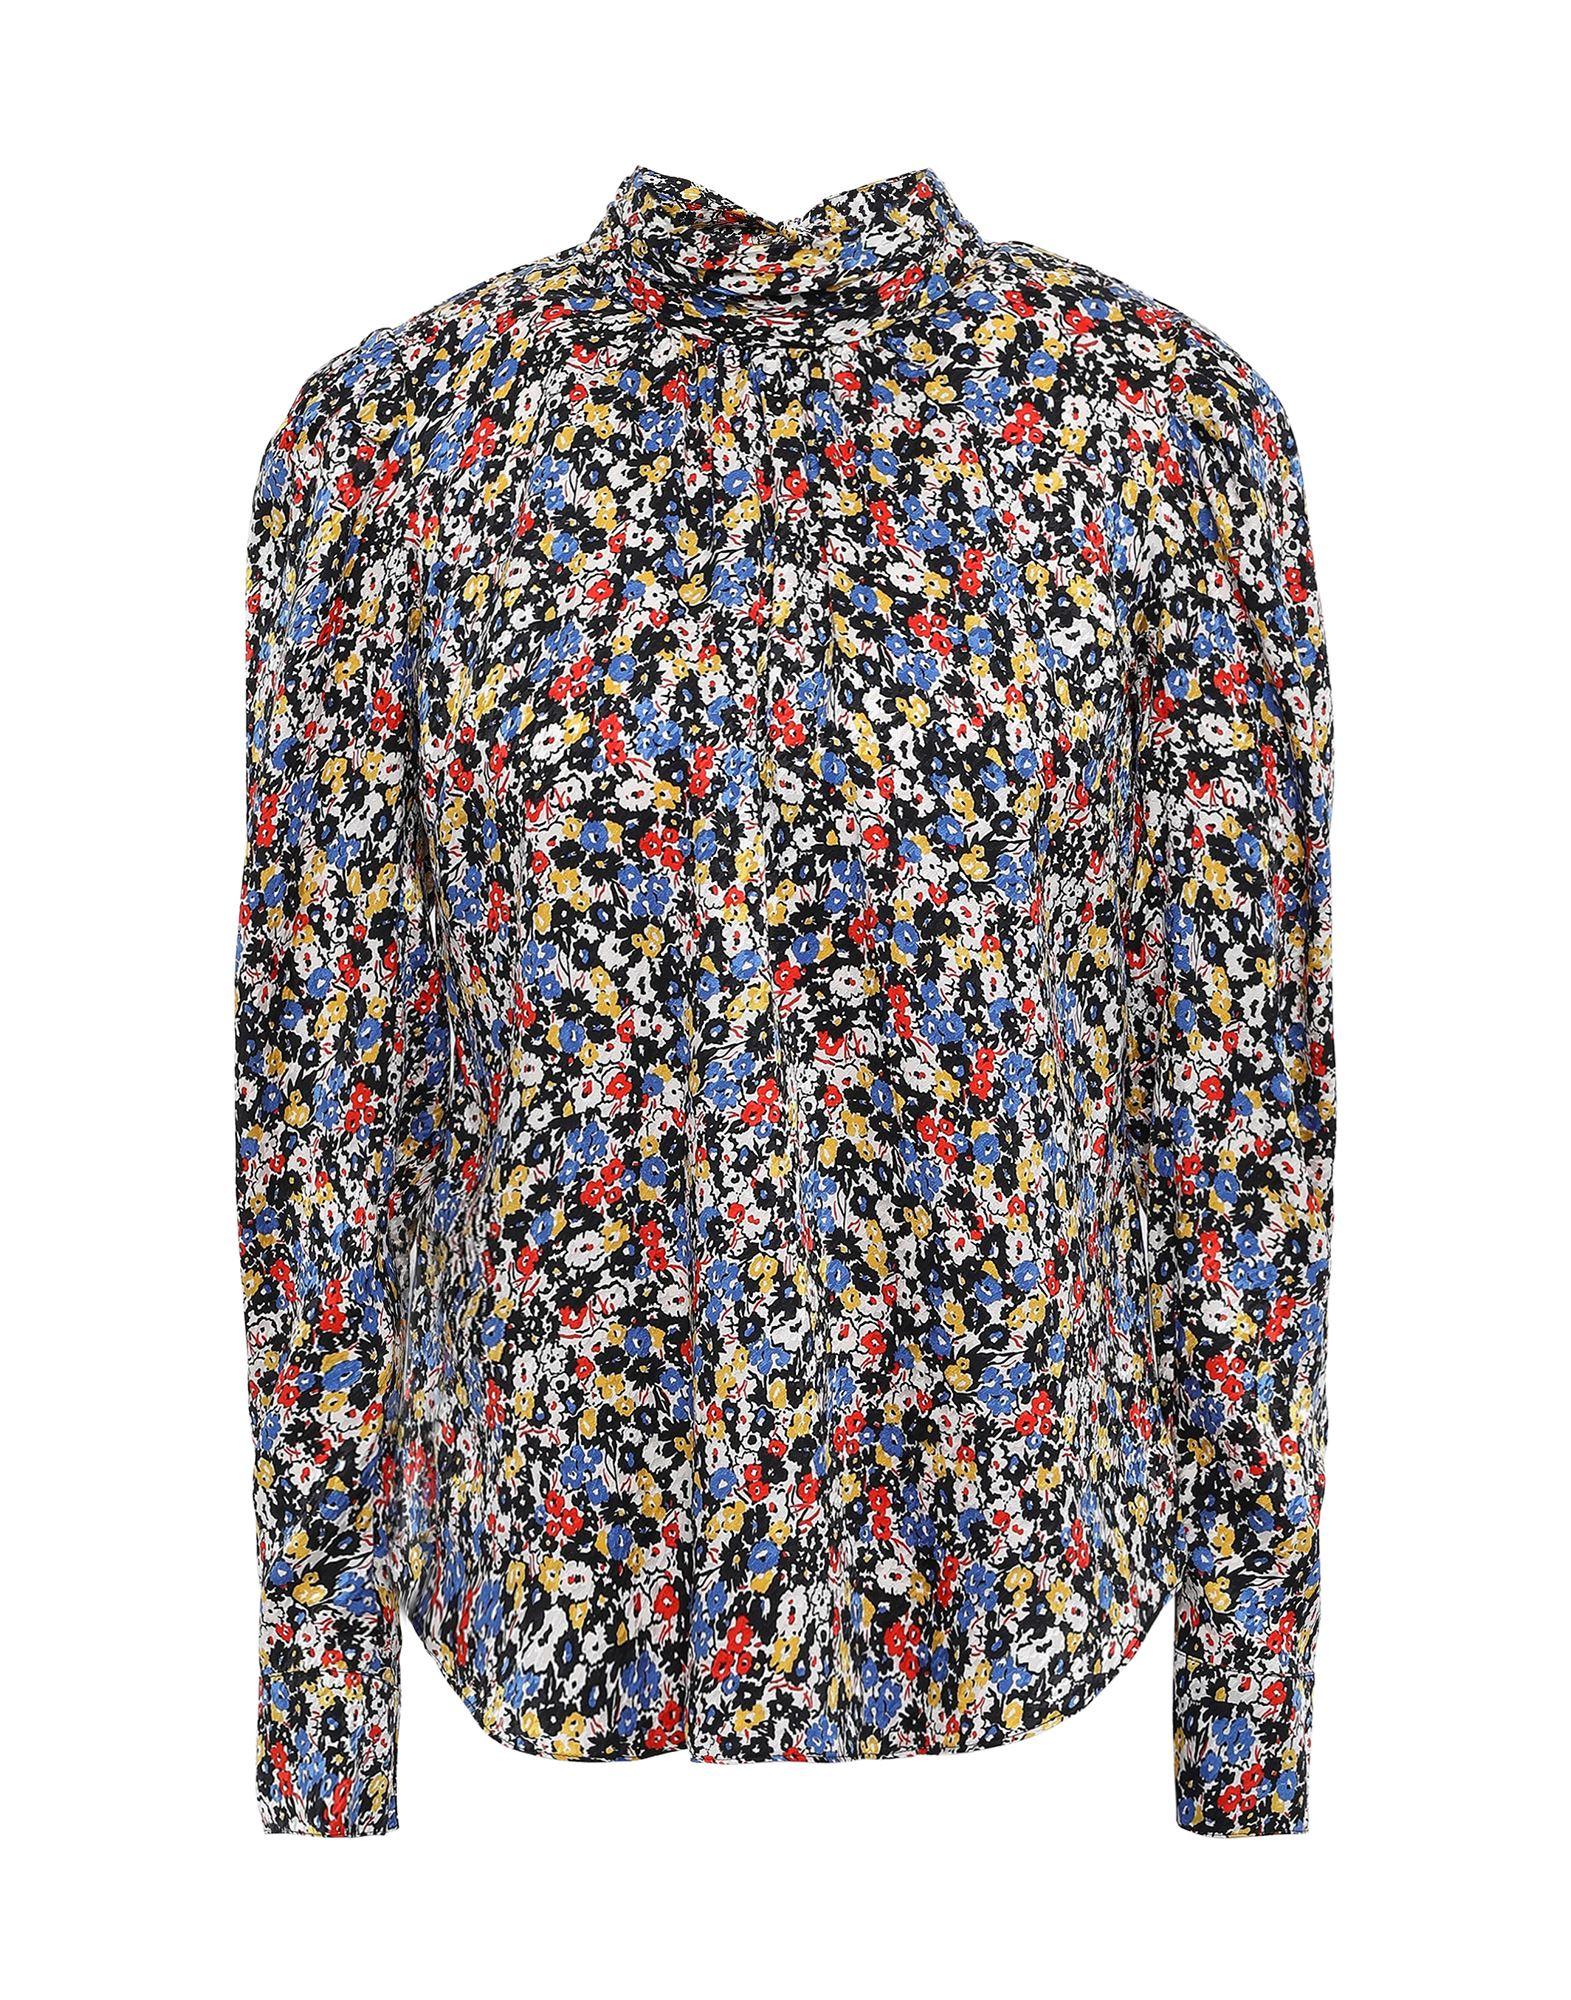 VERONICA BEARD Blouses. crepe, no appliqués, floral design, rear closure, self-tie wrap closure, long sleeves, buttoned cuffs, round collar, no pockets, stretch. 90% Silk, 10% Elastane